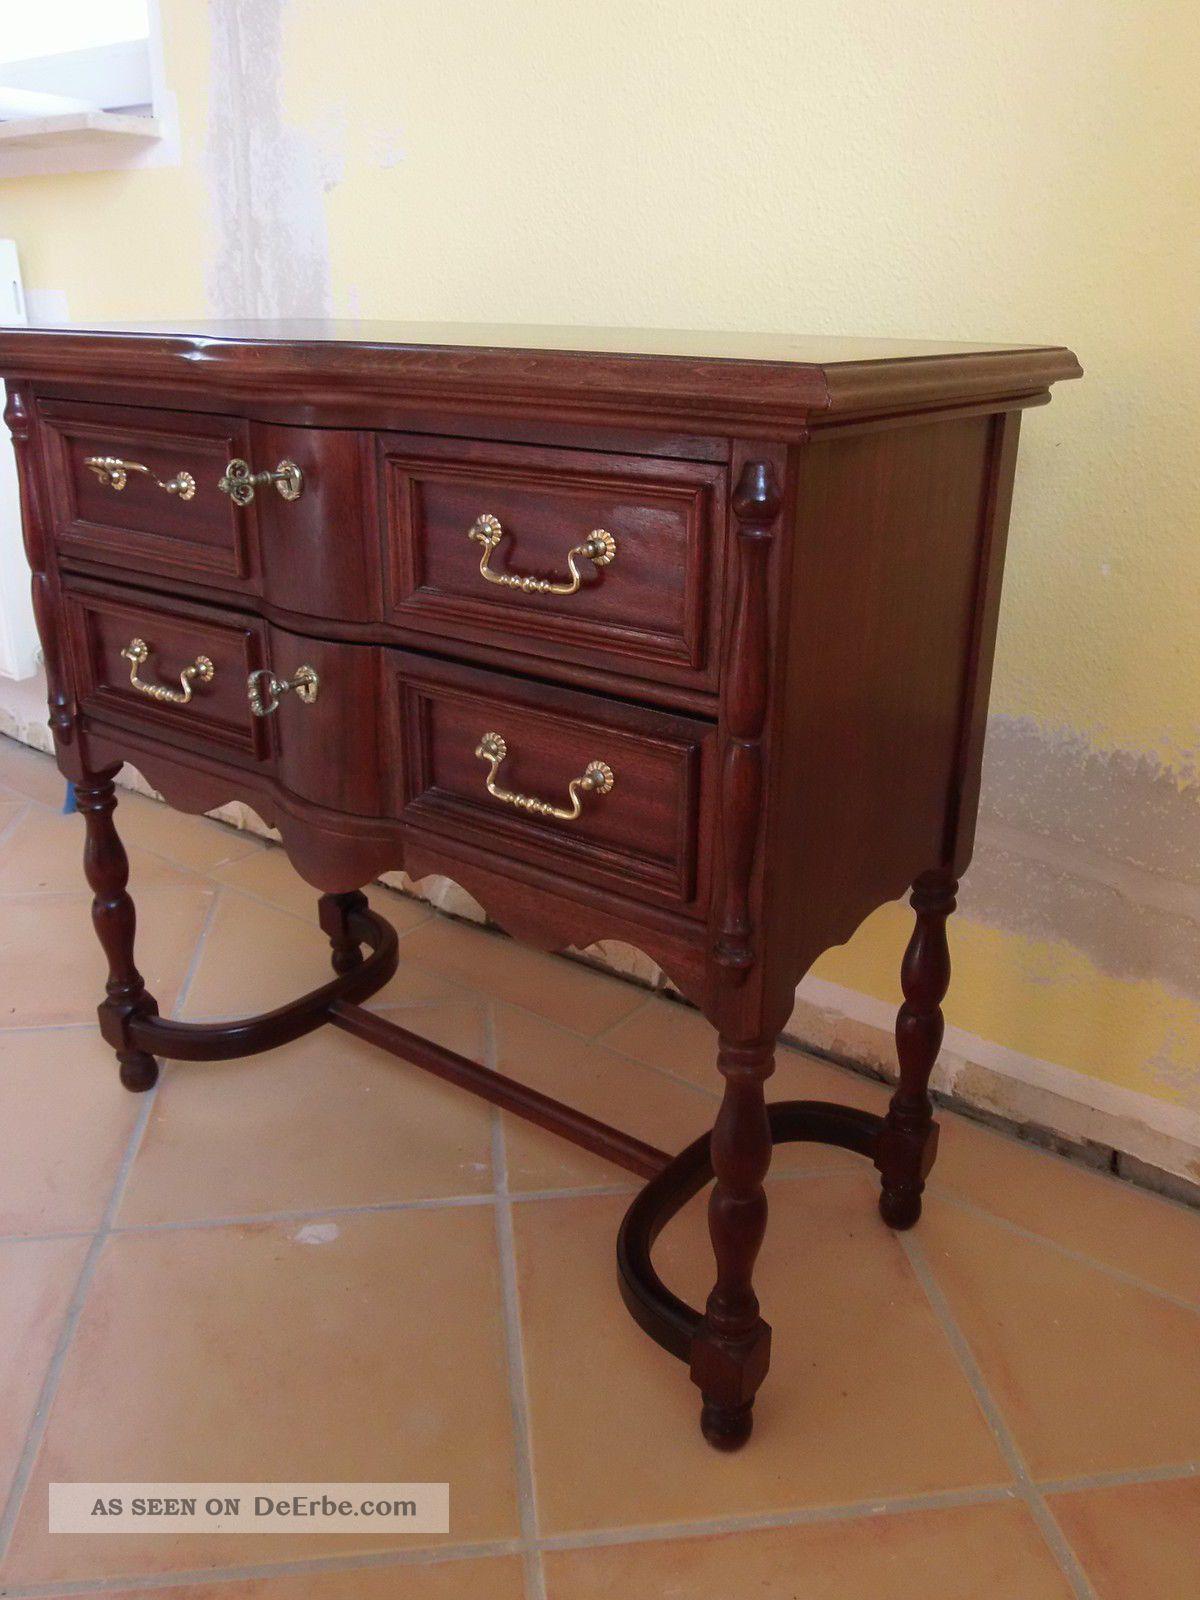 kommode auf englisch elegant englisch kampagne kommode schubladen kabinett satinwood colonial. Black Bedroom Furniture Sets. Home Design Ideas